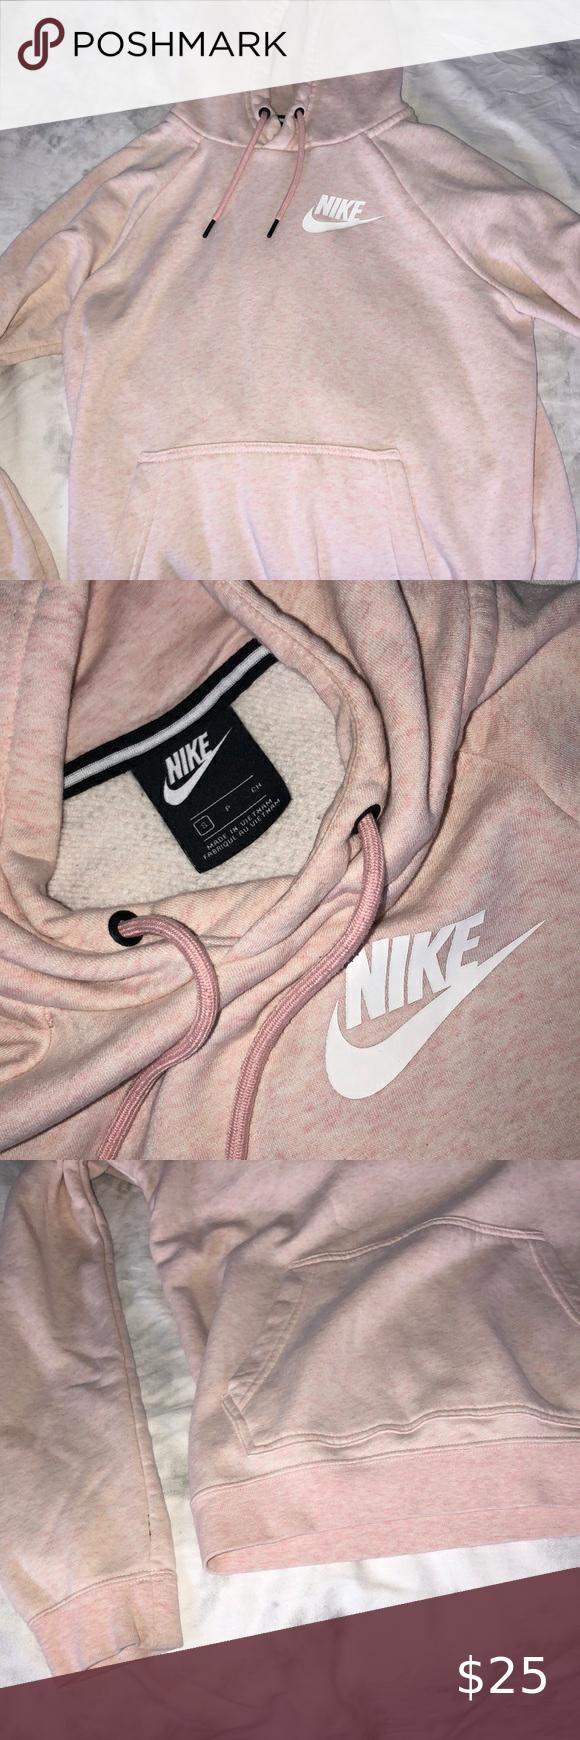 Womens Small Nike Sweatshirt Nike Sweatshirts Clothes Design Fashion [ 1740 x 580 Pixel ]